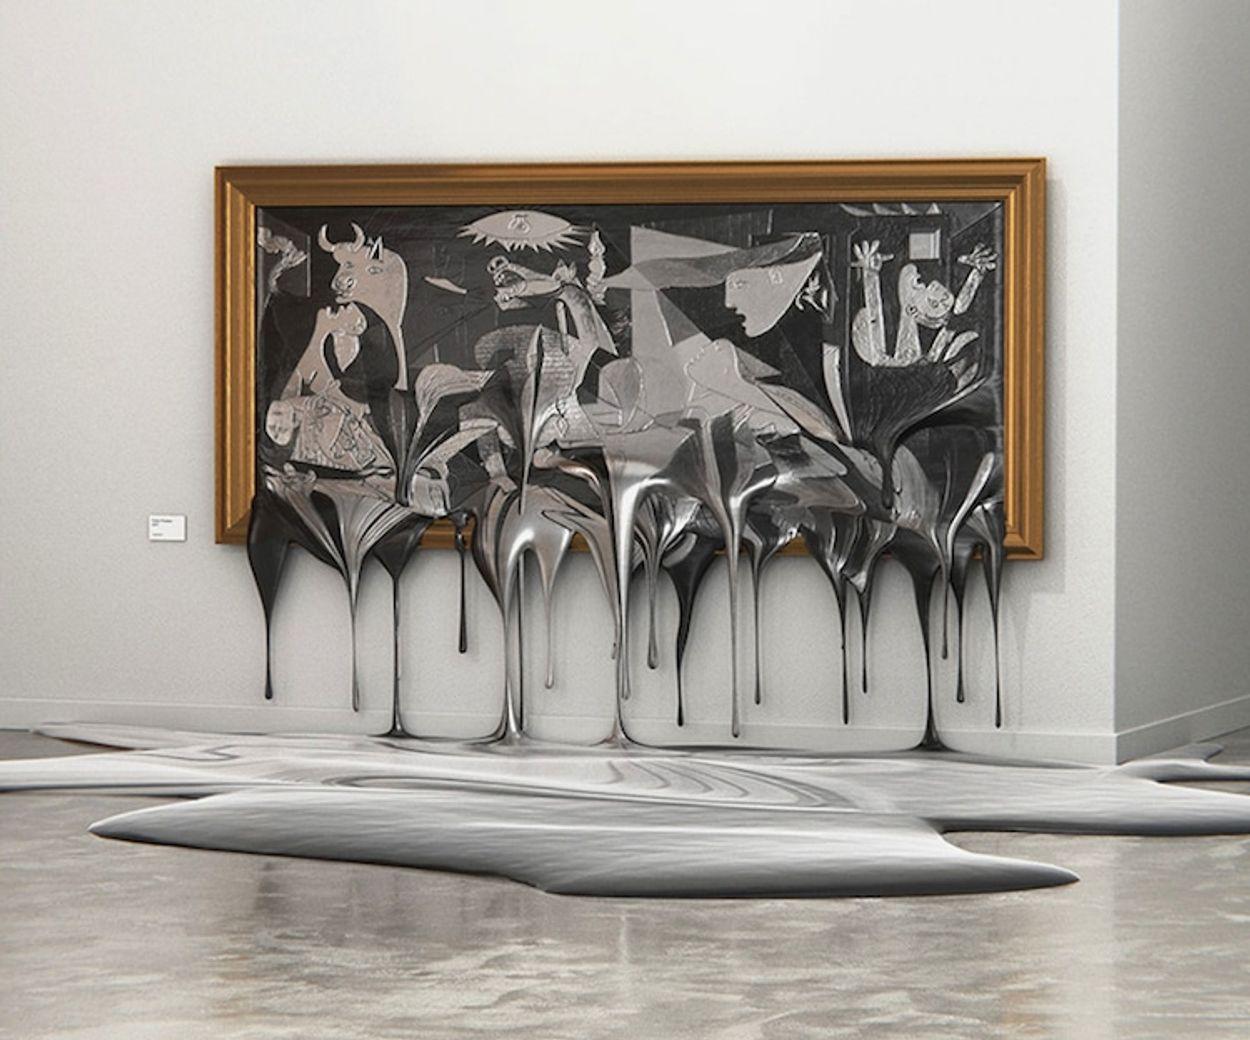 melting-masterpieces-digital-art-alper-dostal-7